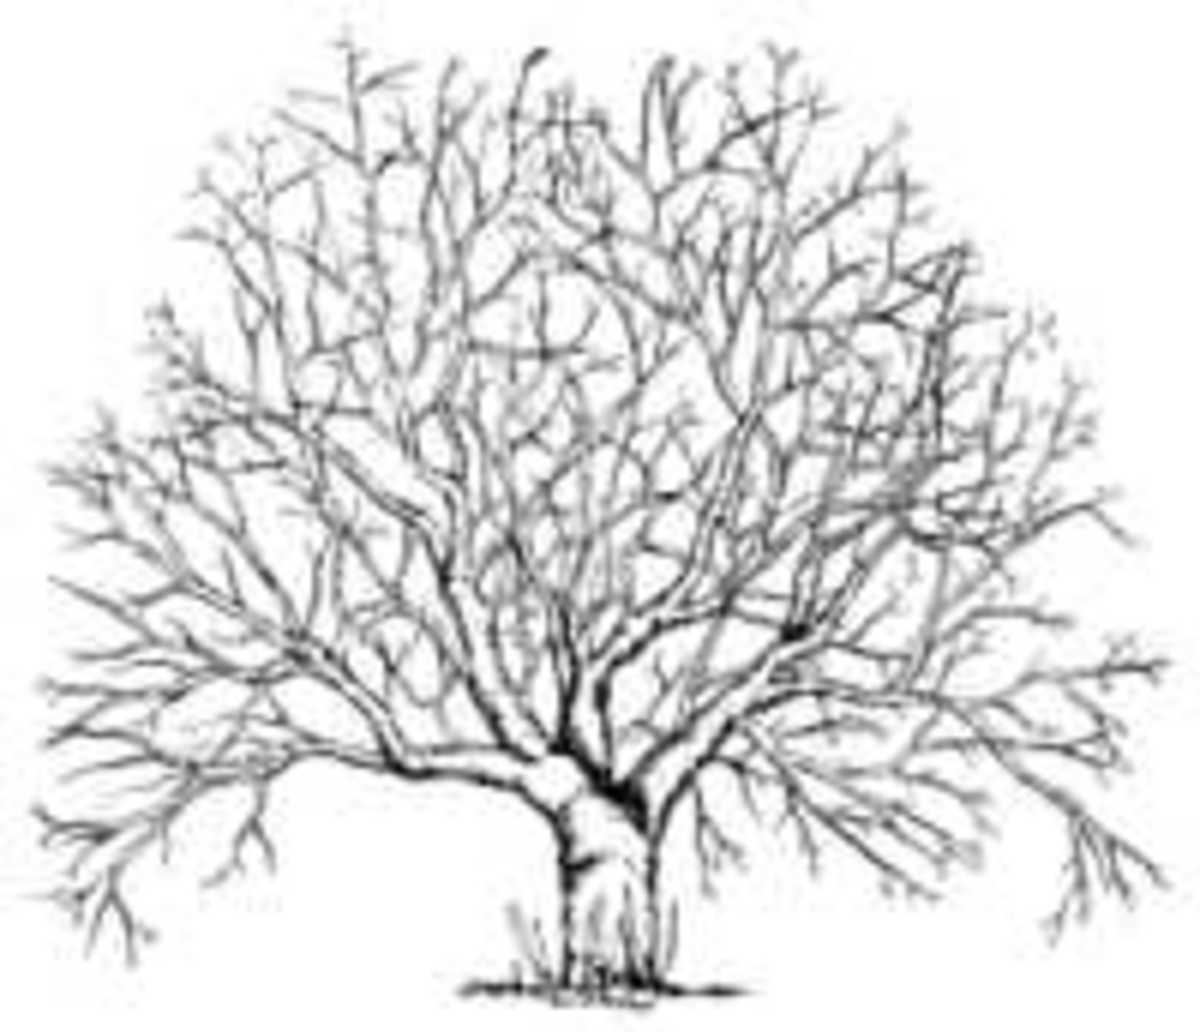 Overgrown Apple Tree